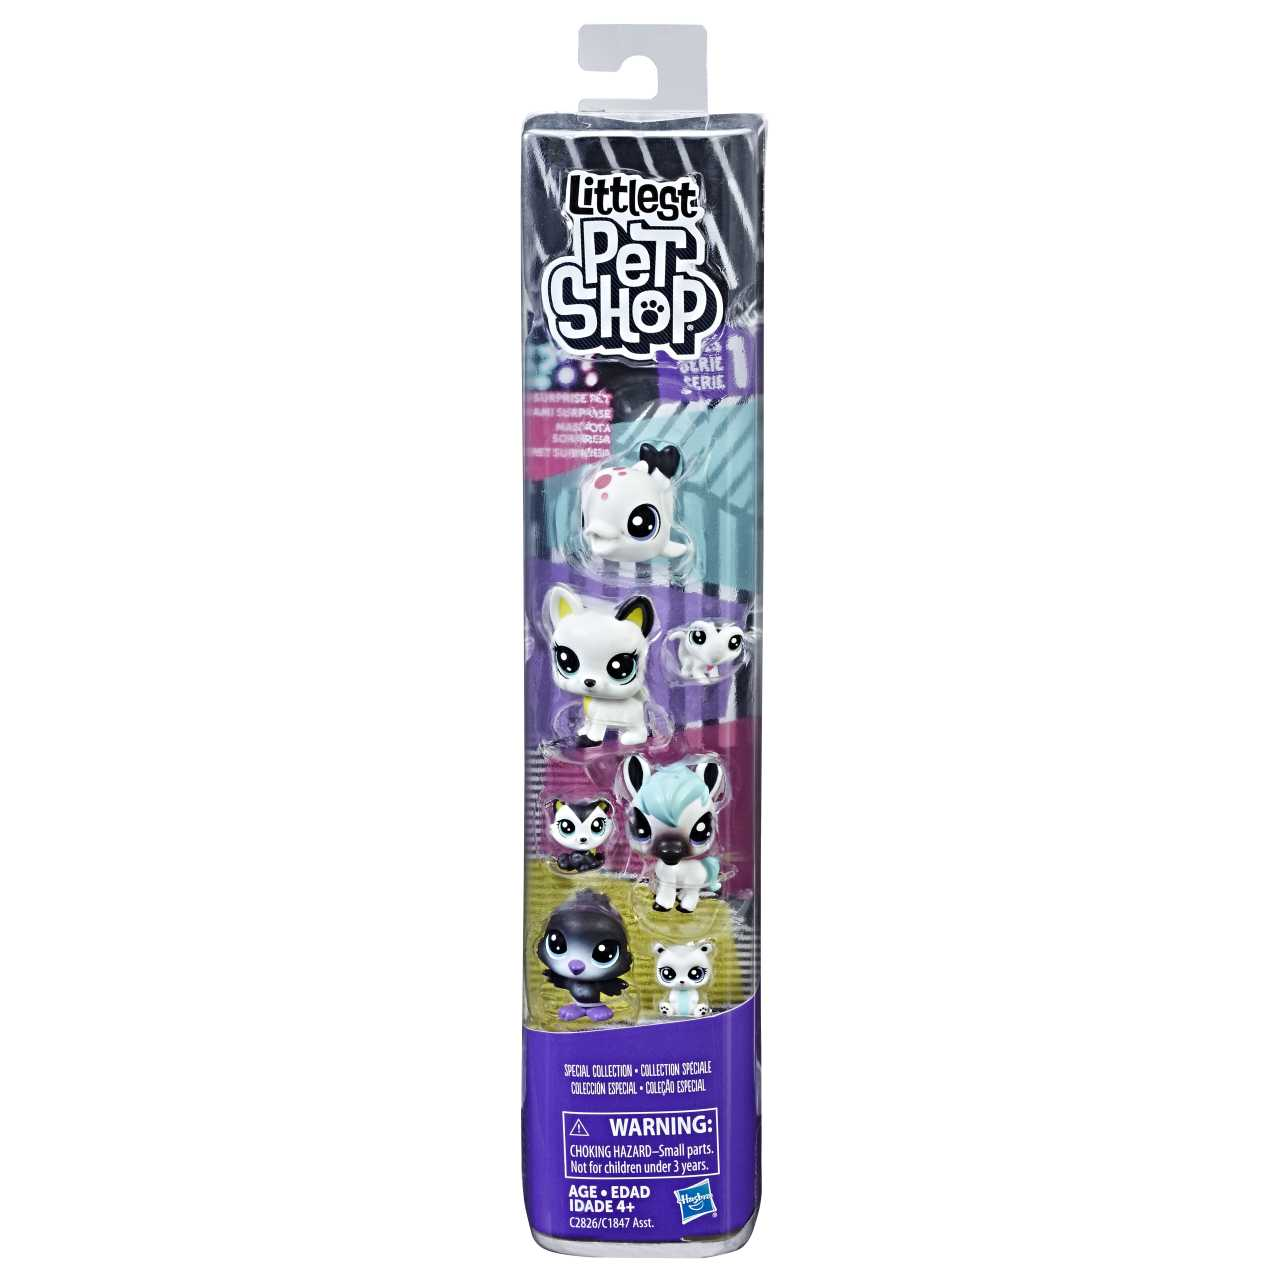 Littlest Pet Shop Černobílá zvířátka duo asst